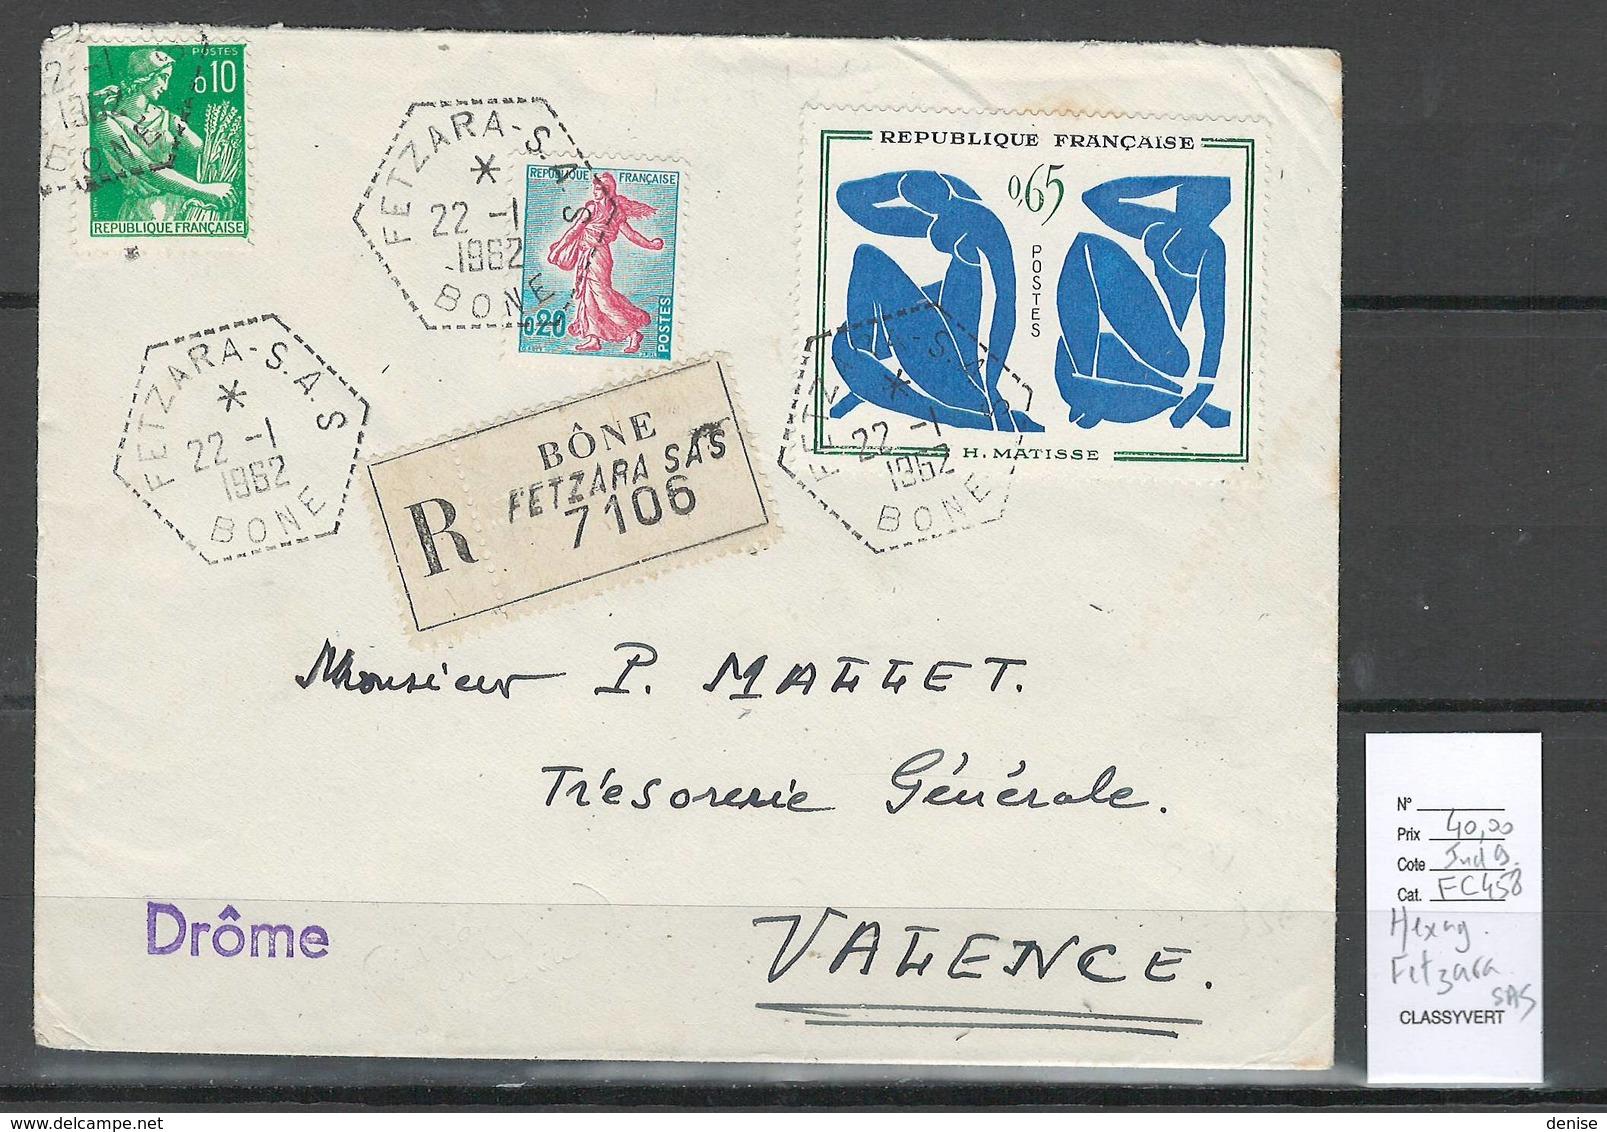 Algerie - Lettre  - Cachet Hexagonal FETZARA - SAS -  Marcophilie - Algeria (1924-1962)